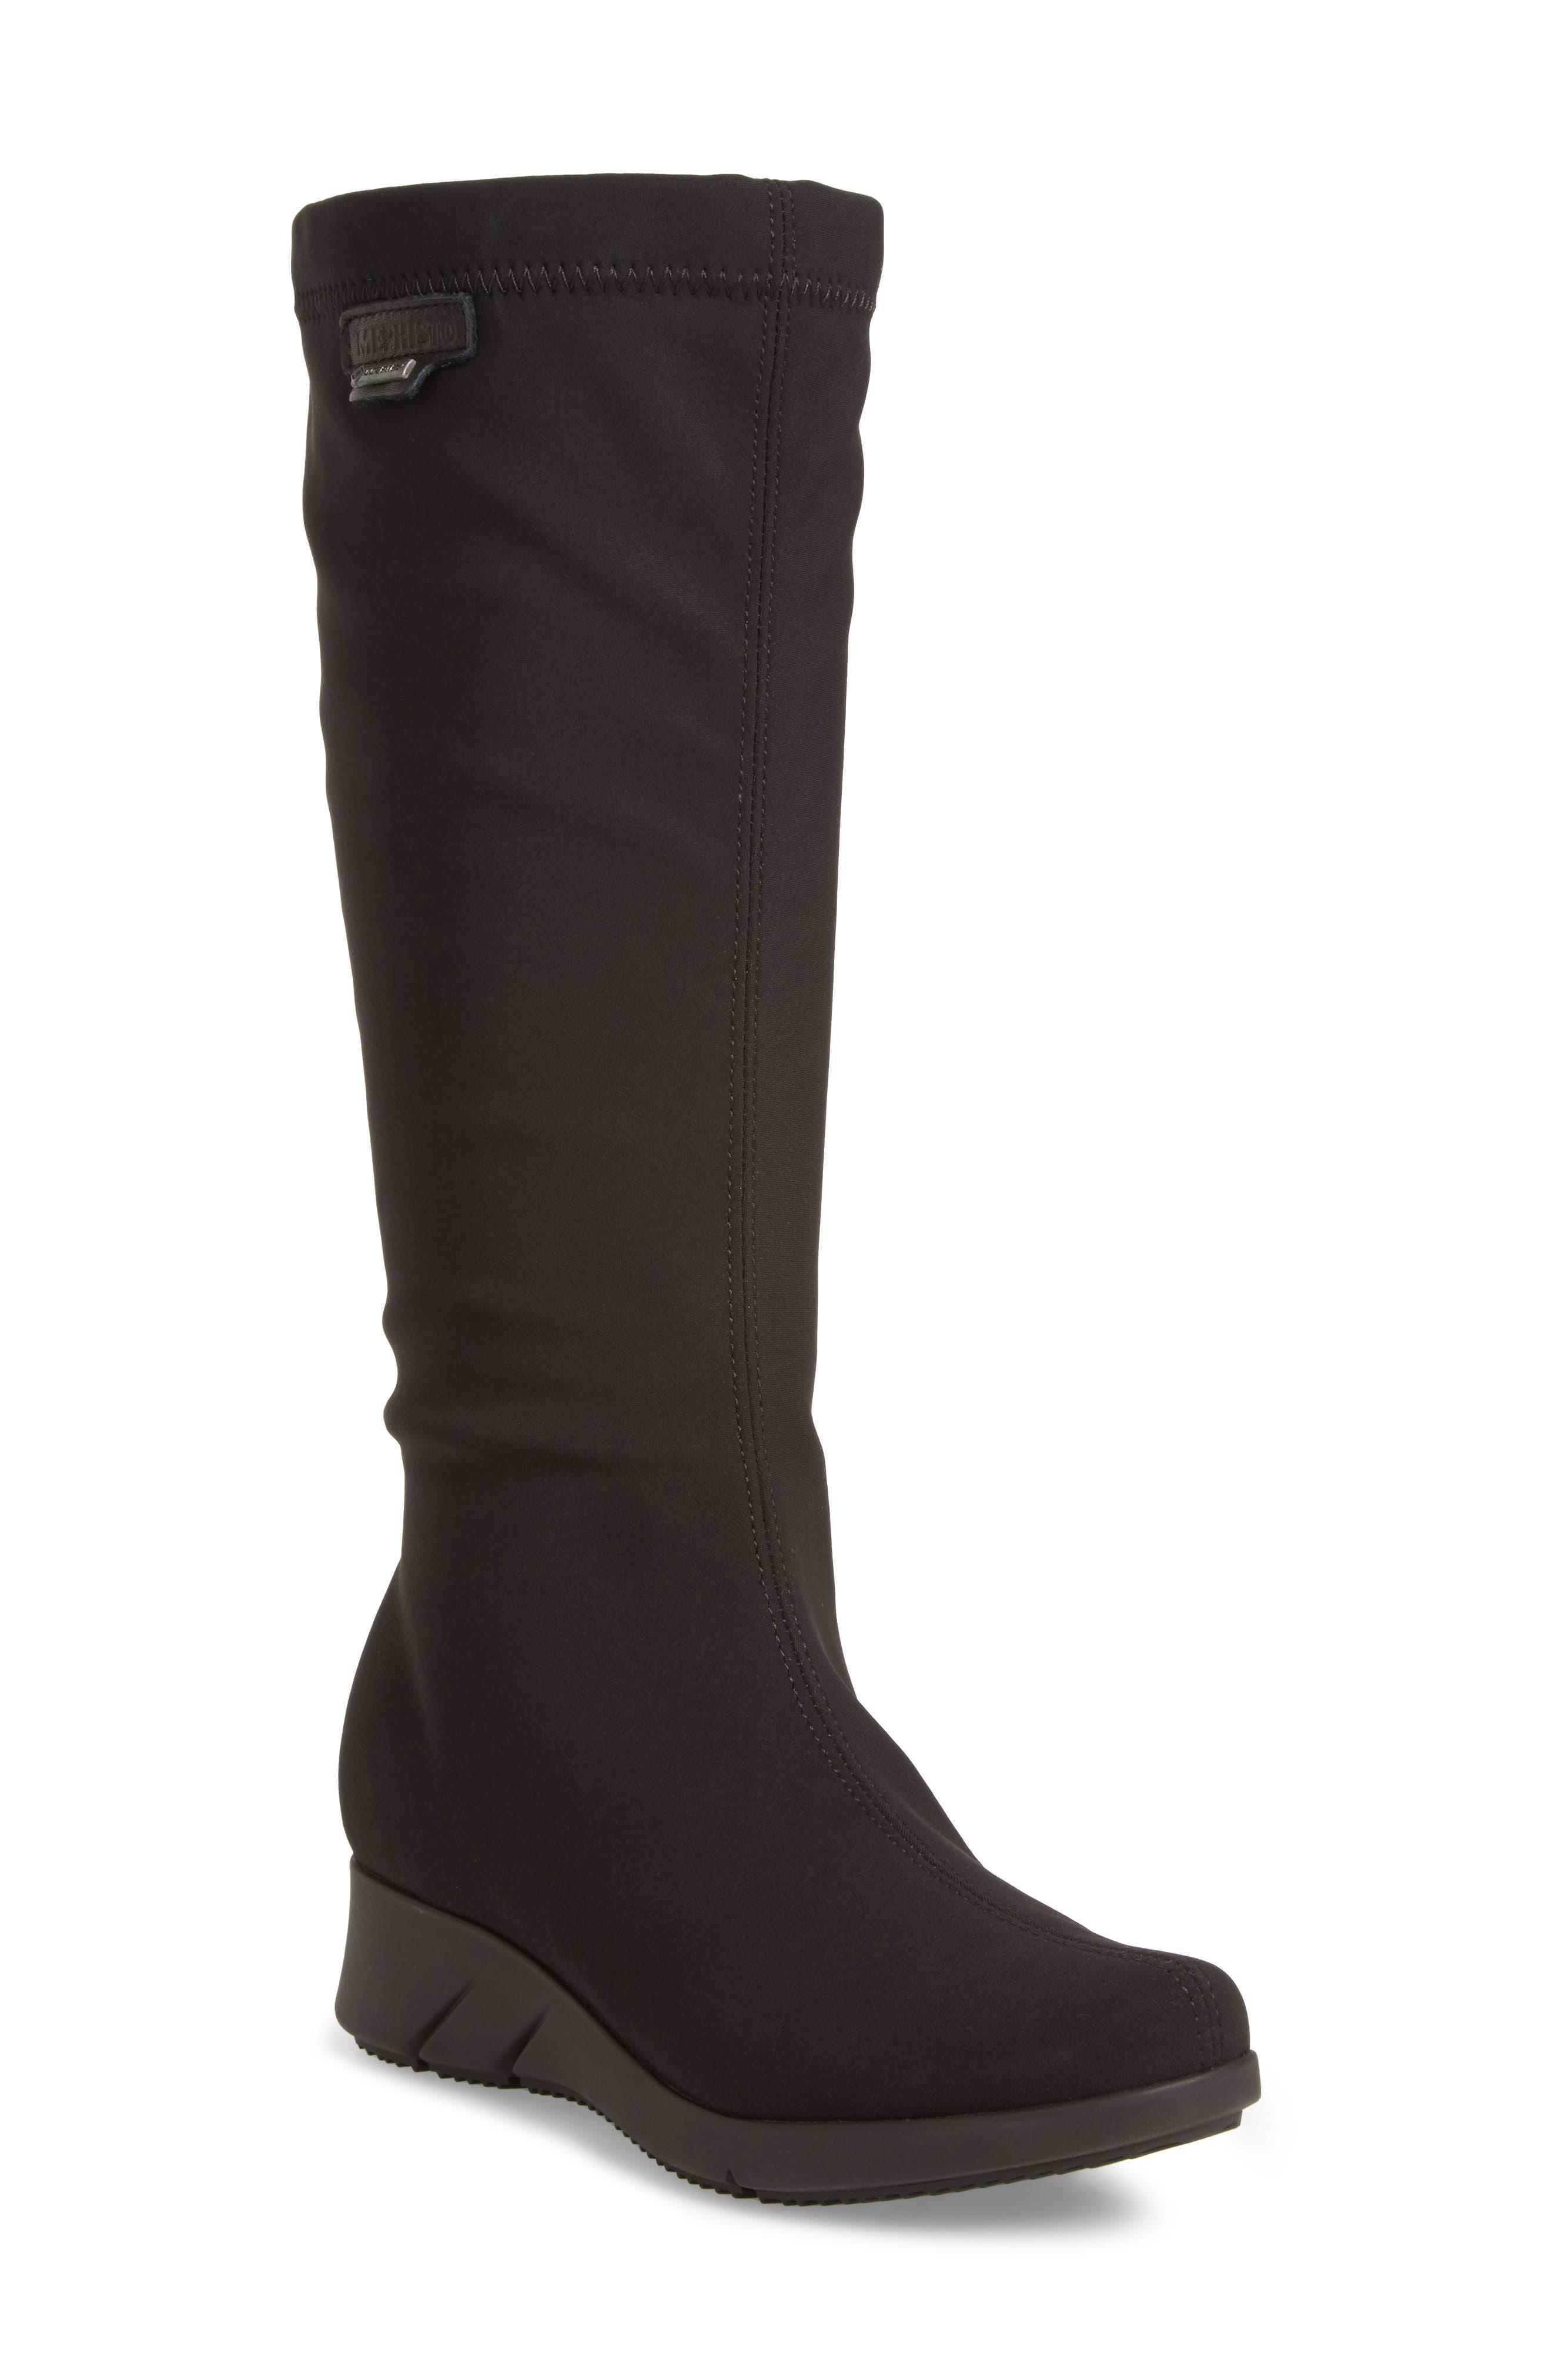 Minda Waterproof Wedge Boot,                             Main thumbnail 1, color,                             Black Fabric